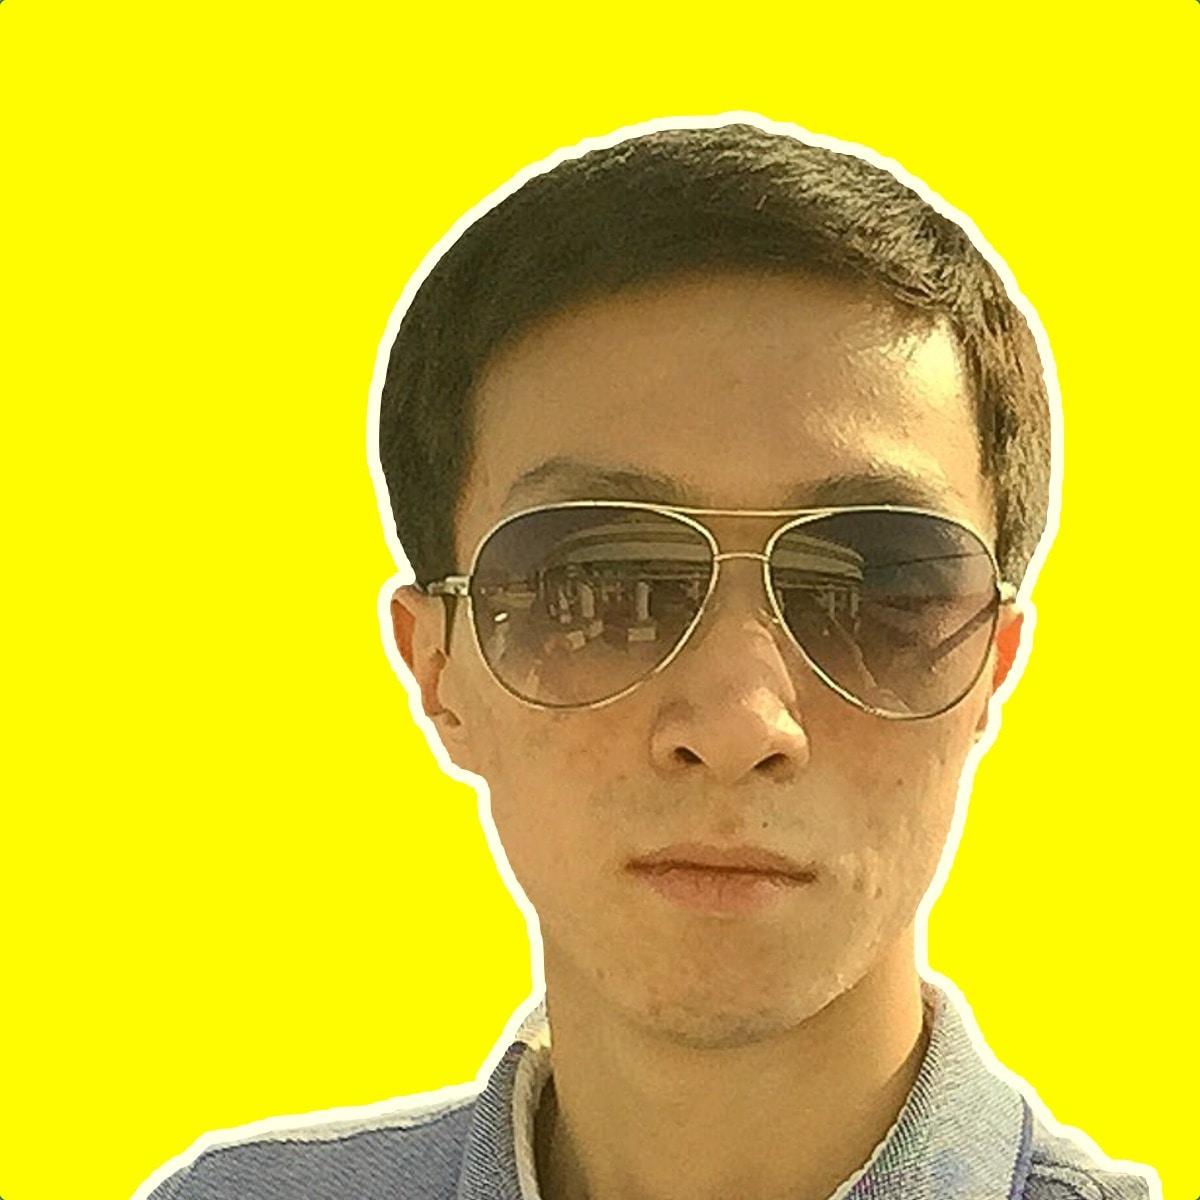 Go to Zanzebek's profile